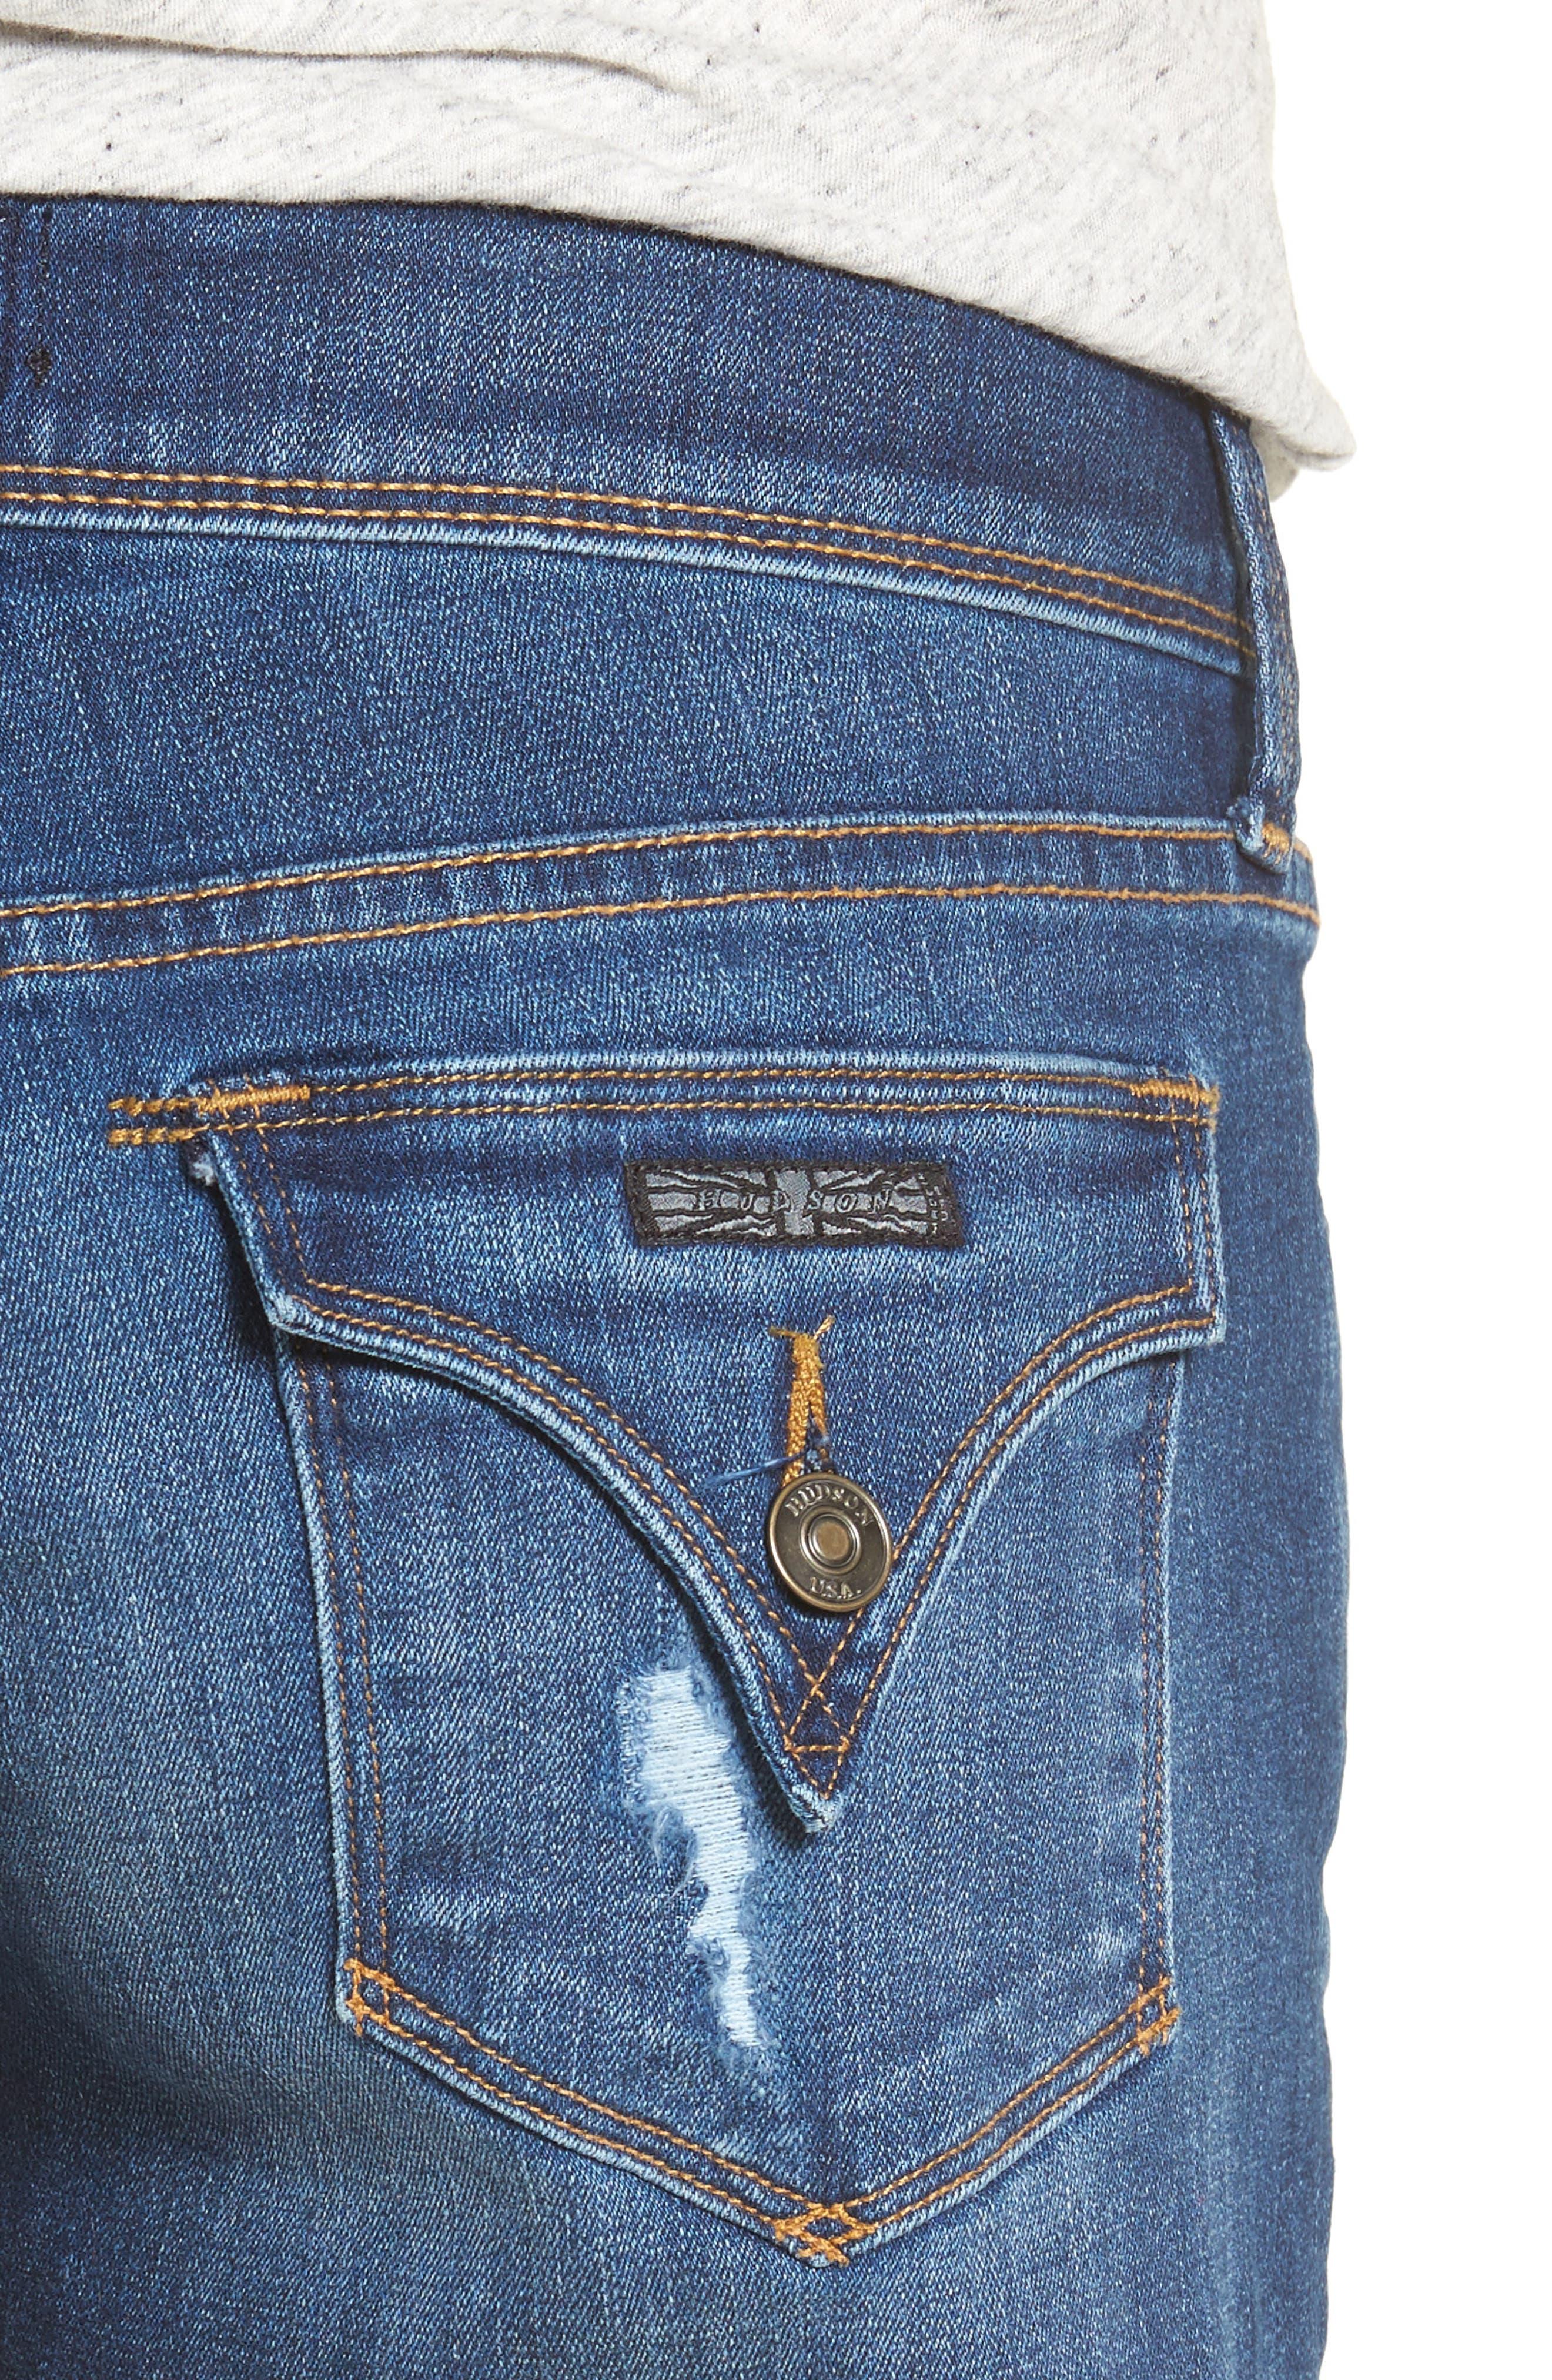 Croxley Cutoff Denim Shorts,                             Alternate thumbnail 4, color,                             401